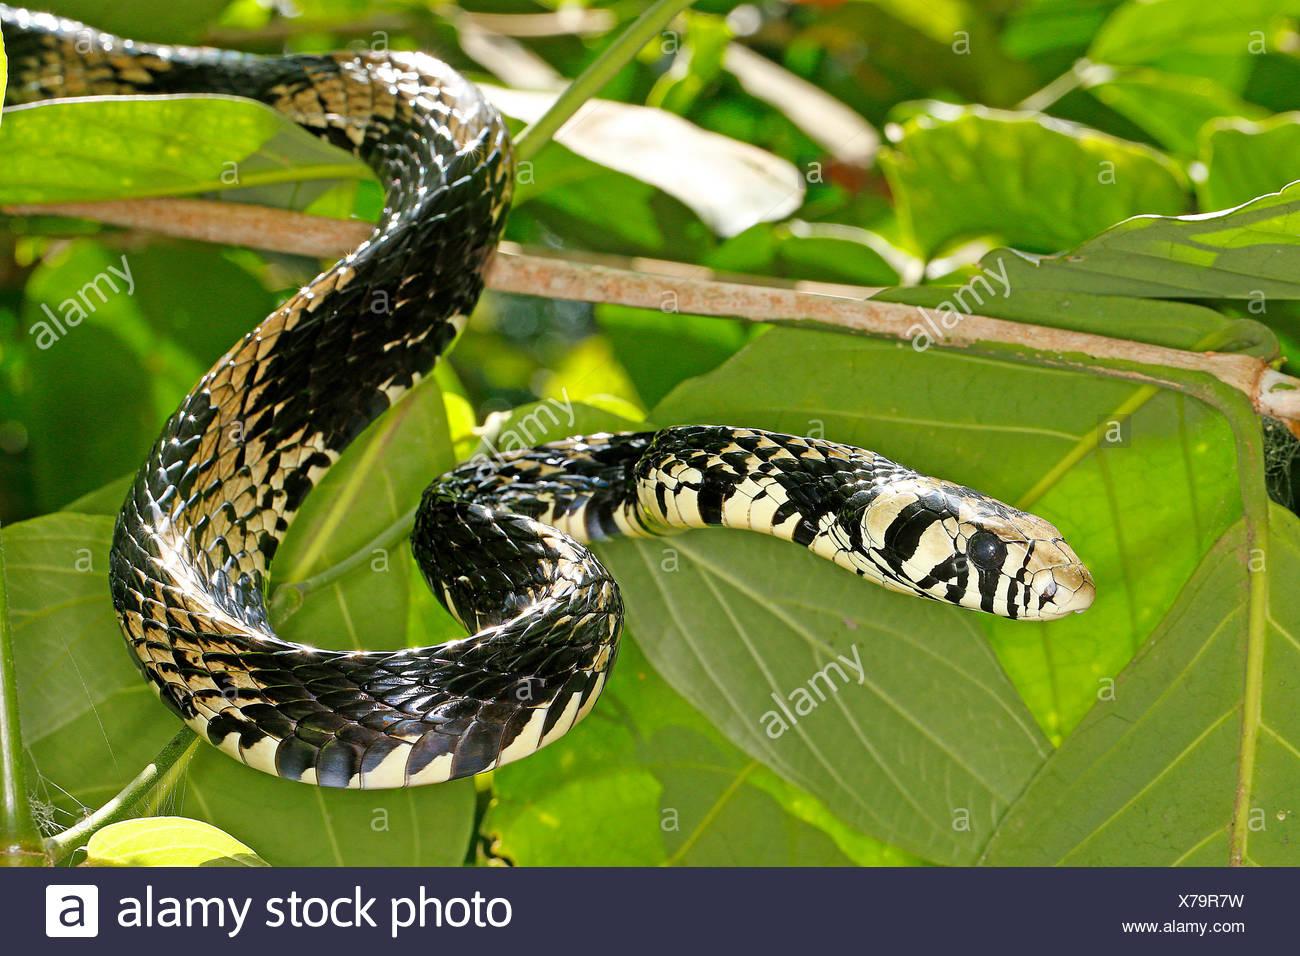 Huehneresser, Huehnerfresser (Spilotes pullatus), Portraet, Costa Rica | Tropical chicken snake, Tiger Ratsnake (Spilotes pullat - Stock Image